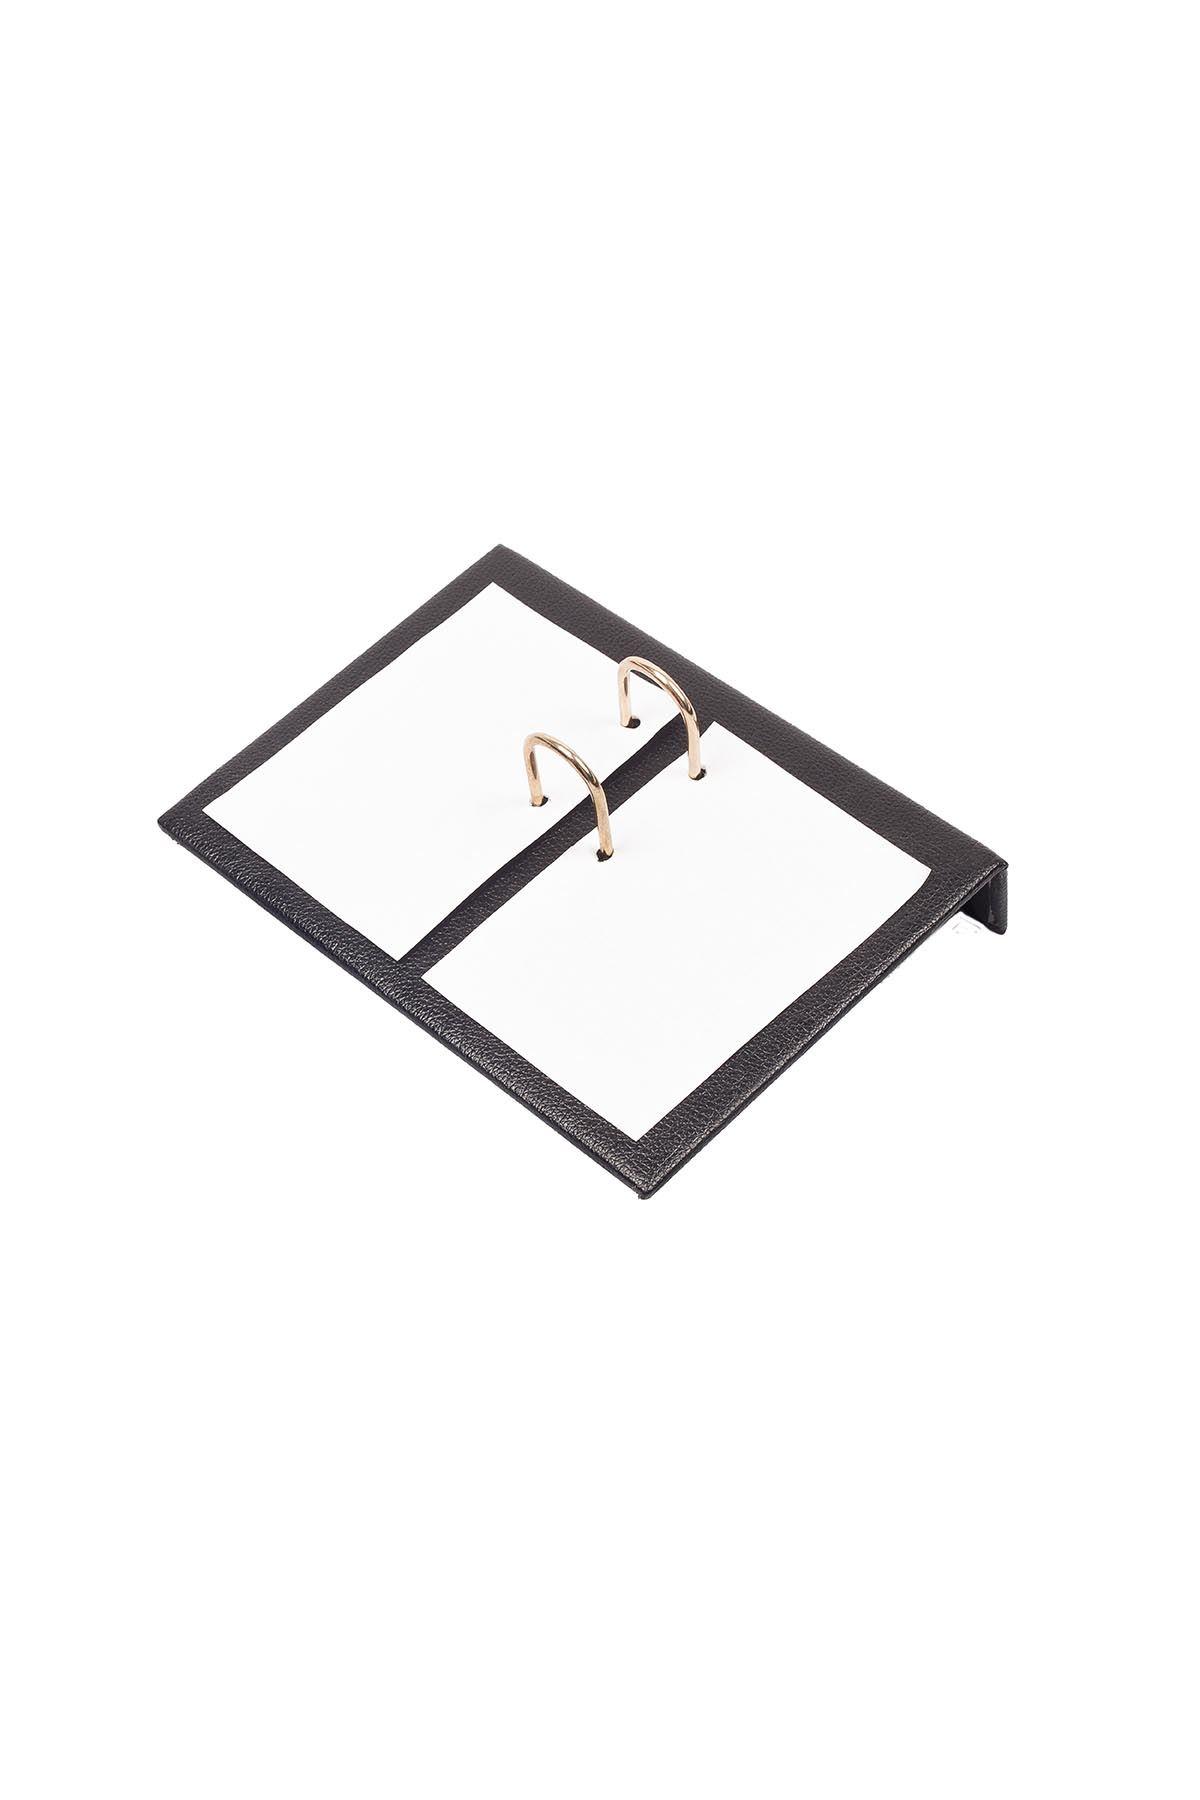 Make Your Own Desk Set White